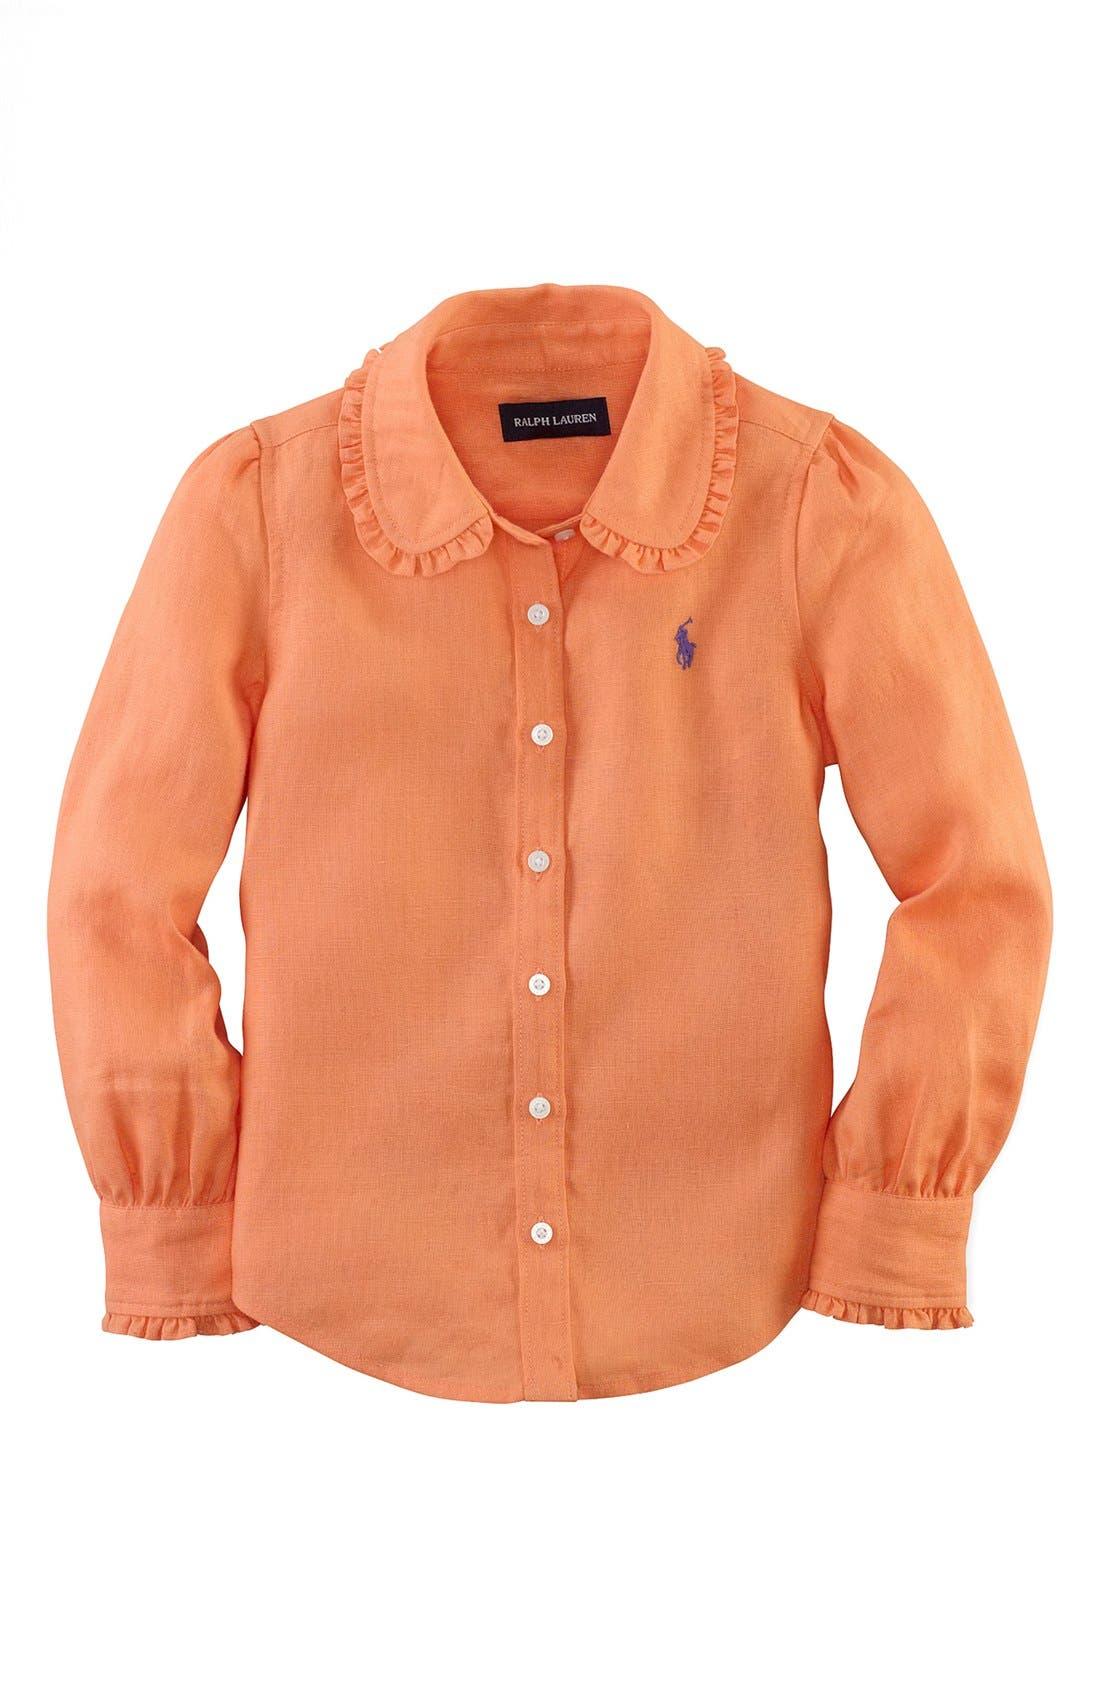 Alternate Image 1 Selected - Ralph Lauren Linen Shirt (Toddler Girls)